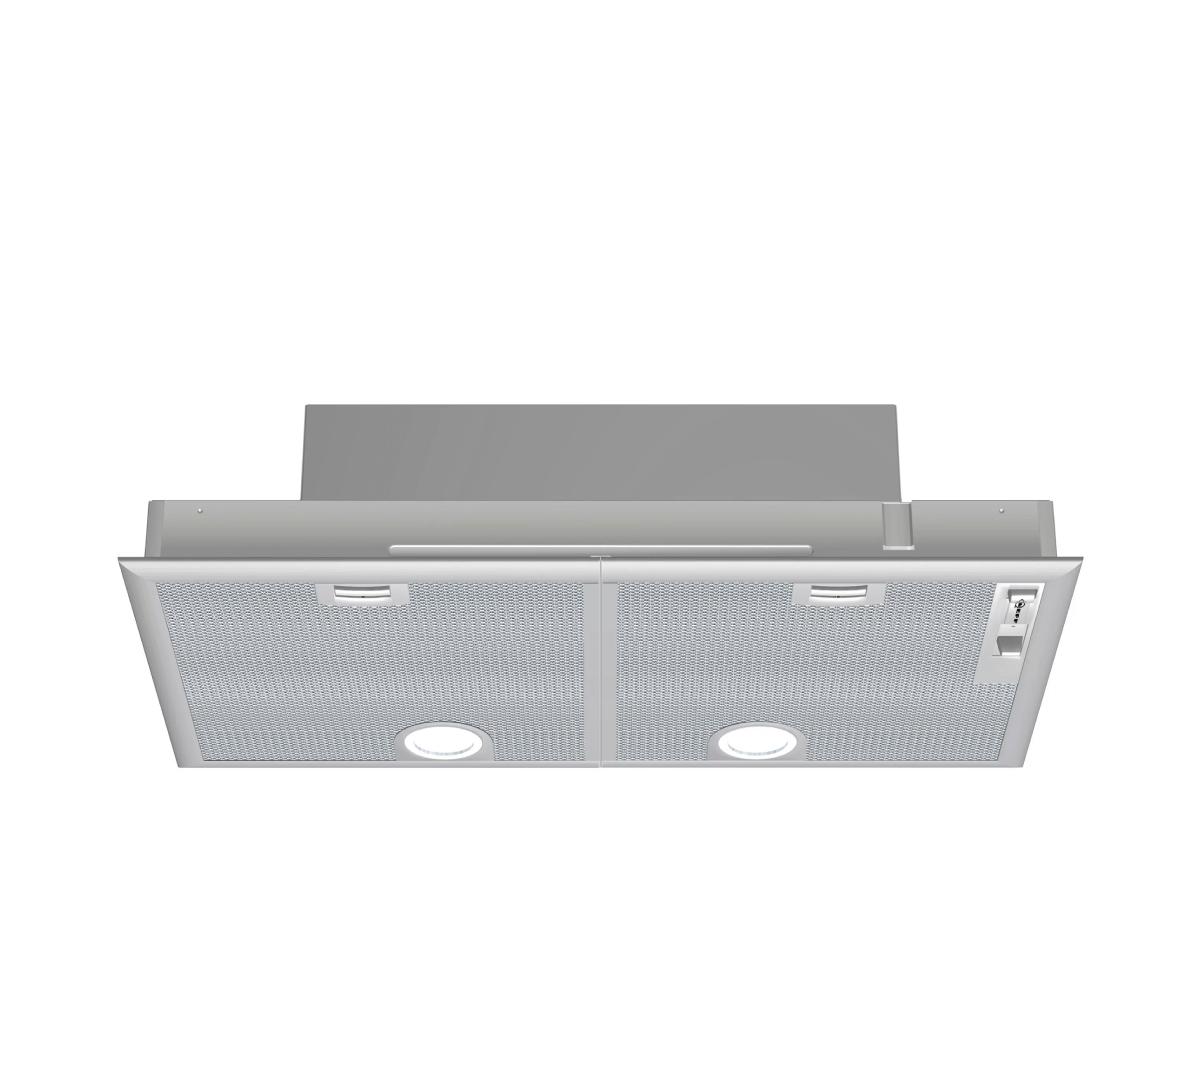 N30 73cm Canopy Hood Metalic Silver